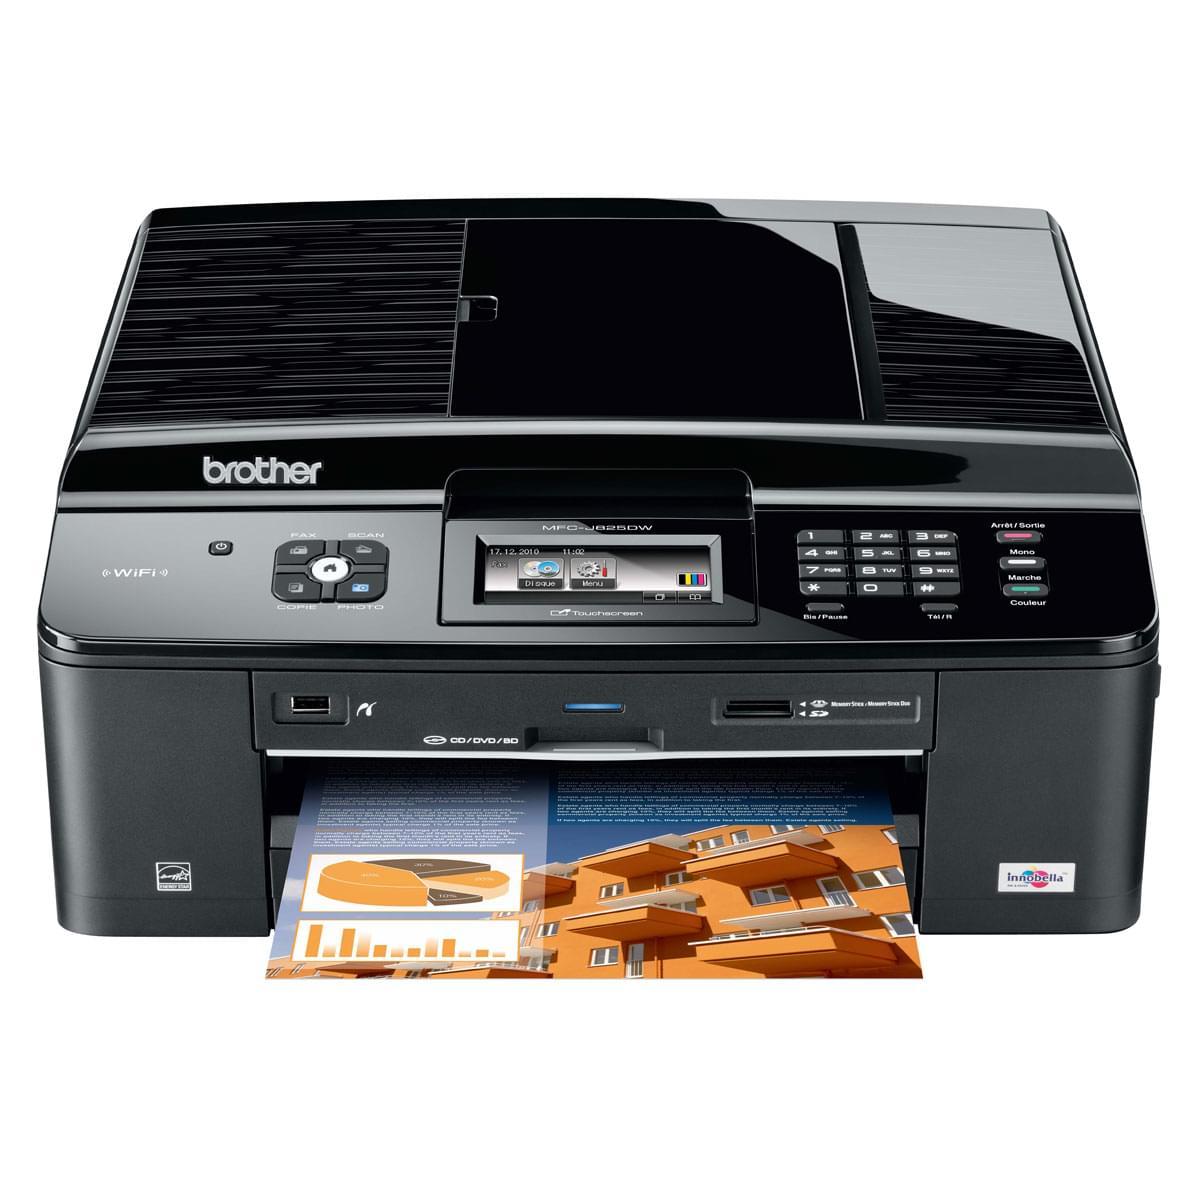 Imprimante multifonction Brother DCP-J525W - Cybertek.fr - 0